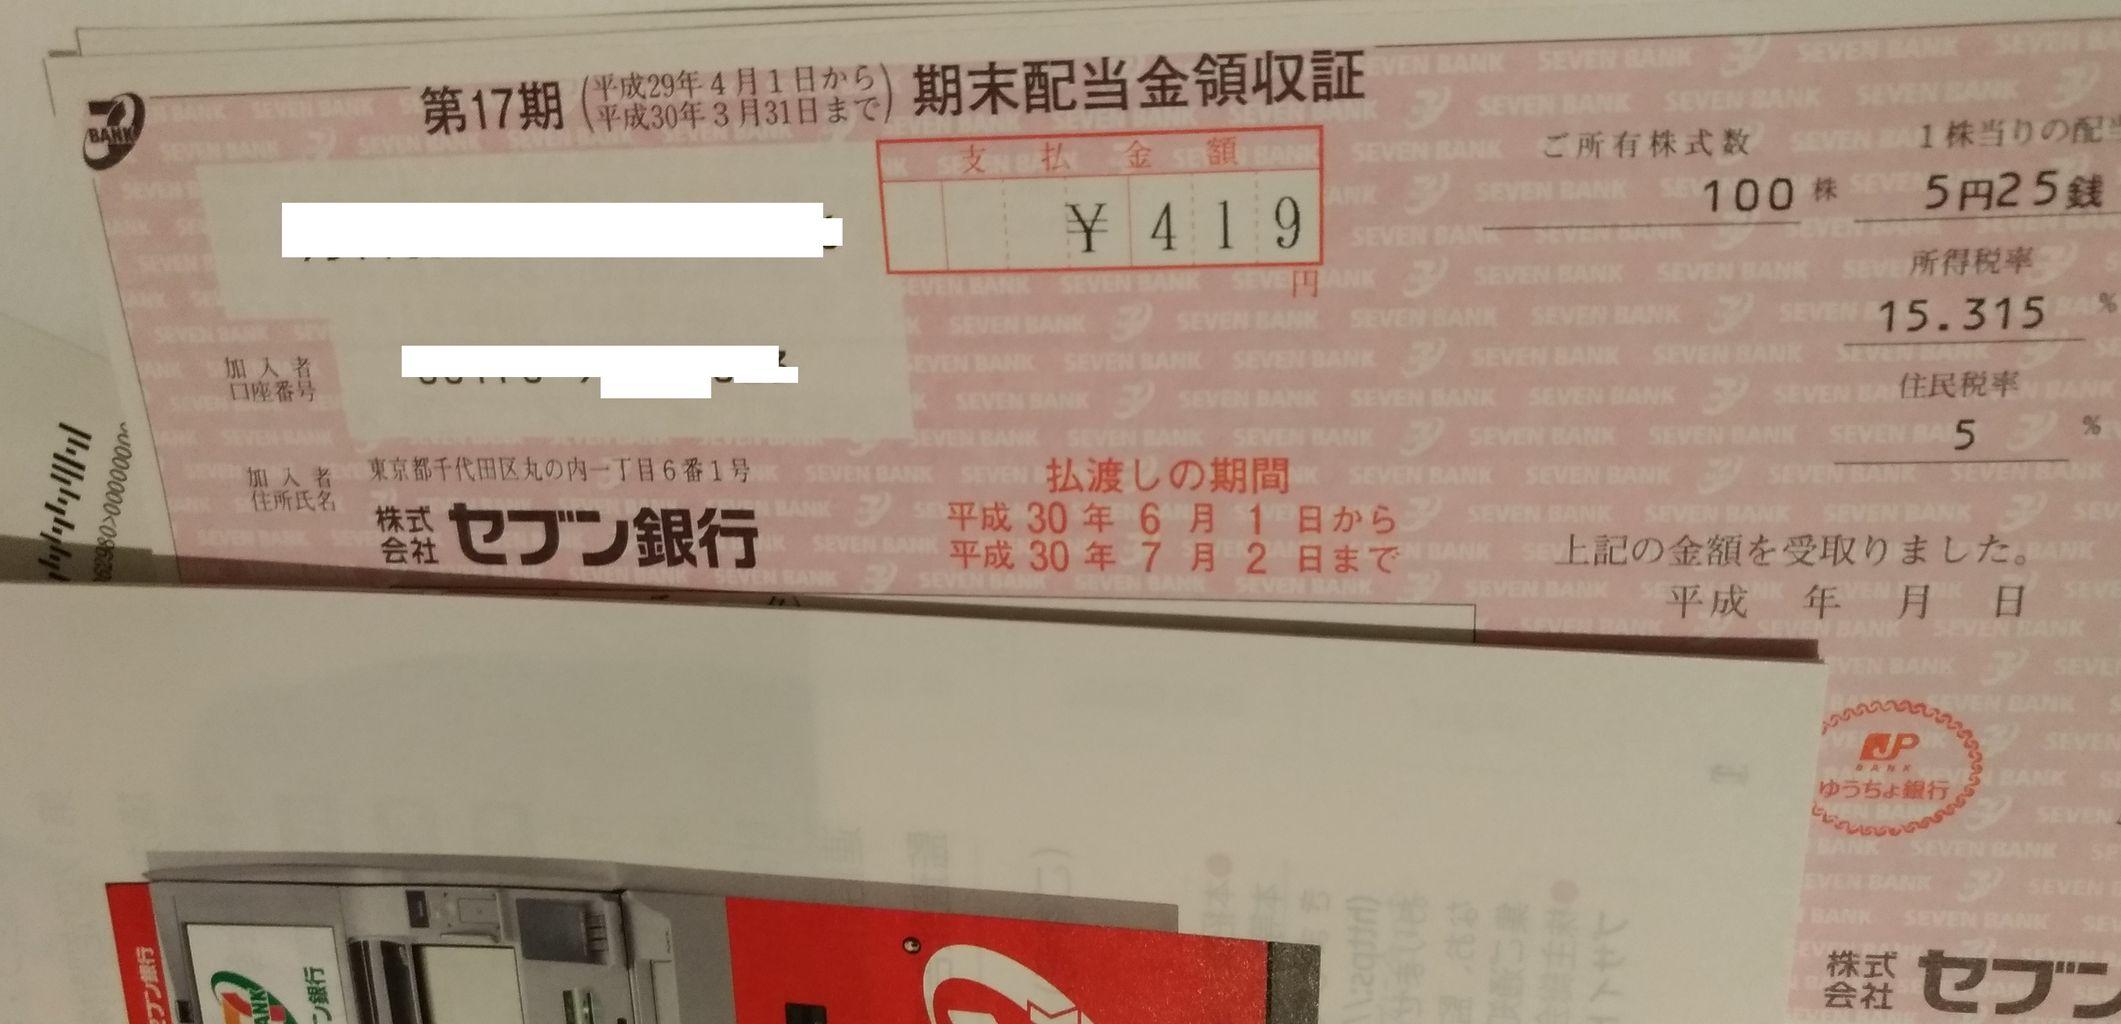 sebun_bank_haito_201806